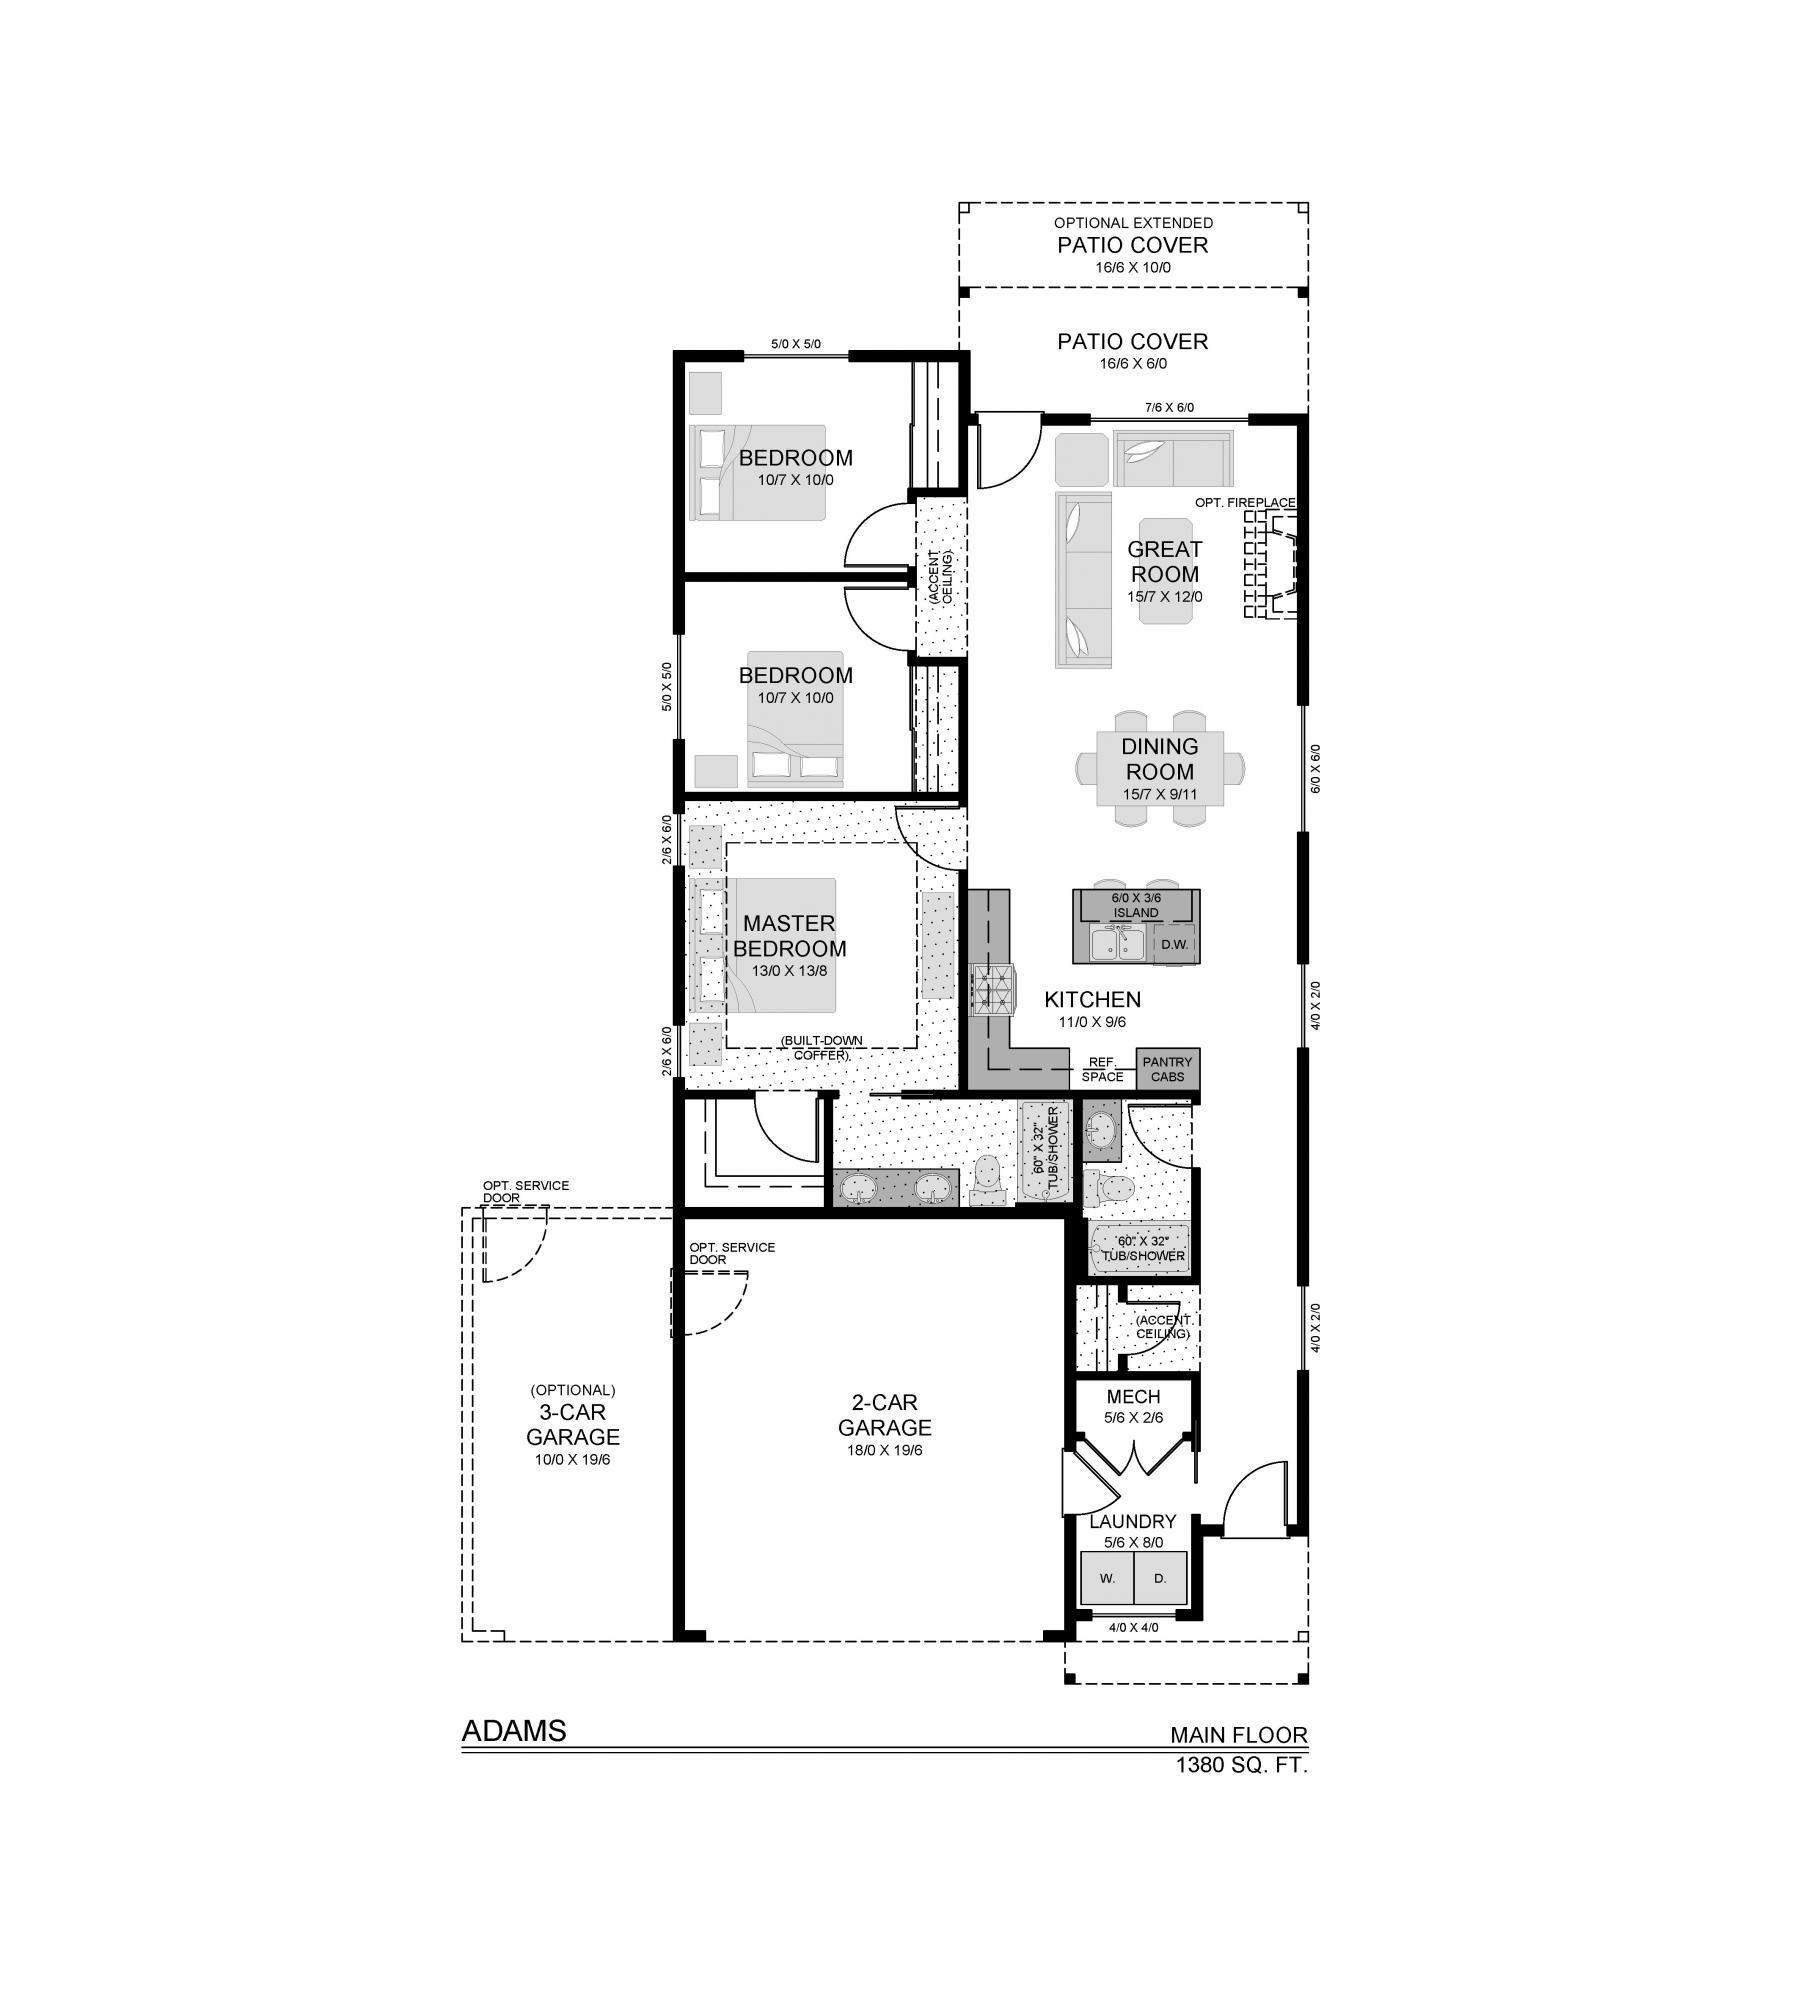 1380 Adams Mf Floor Plan Design Floor Plans House Plans